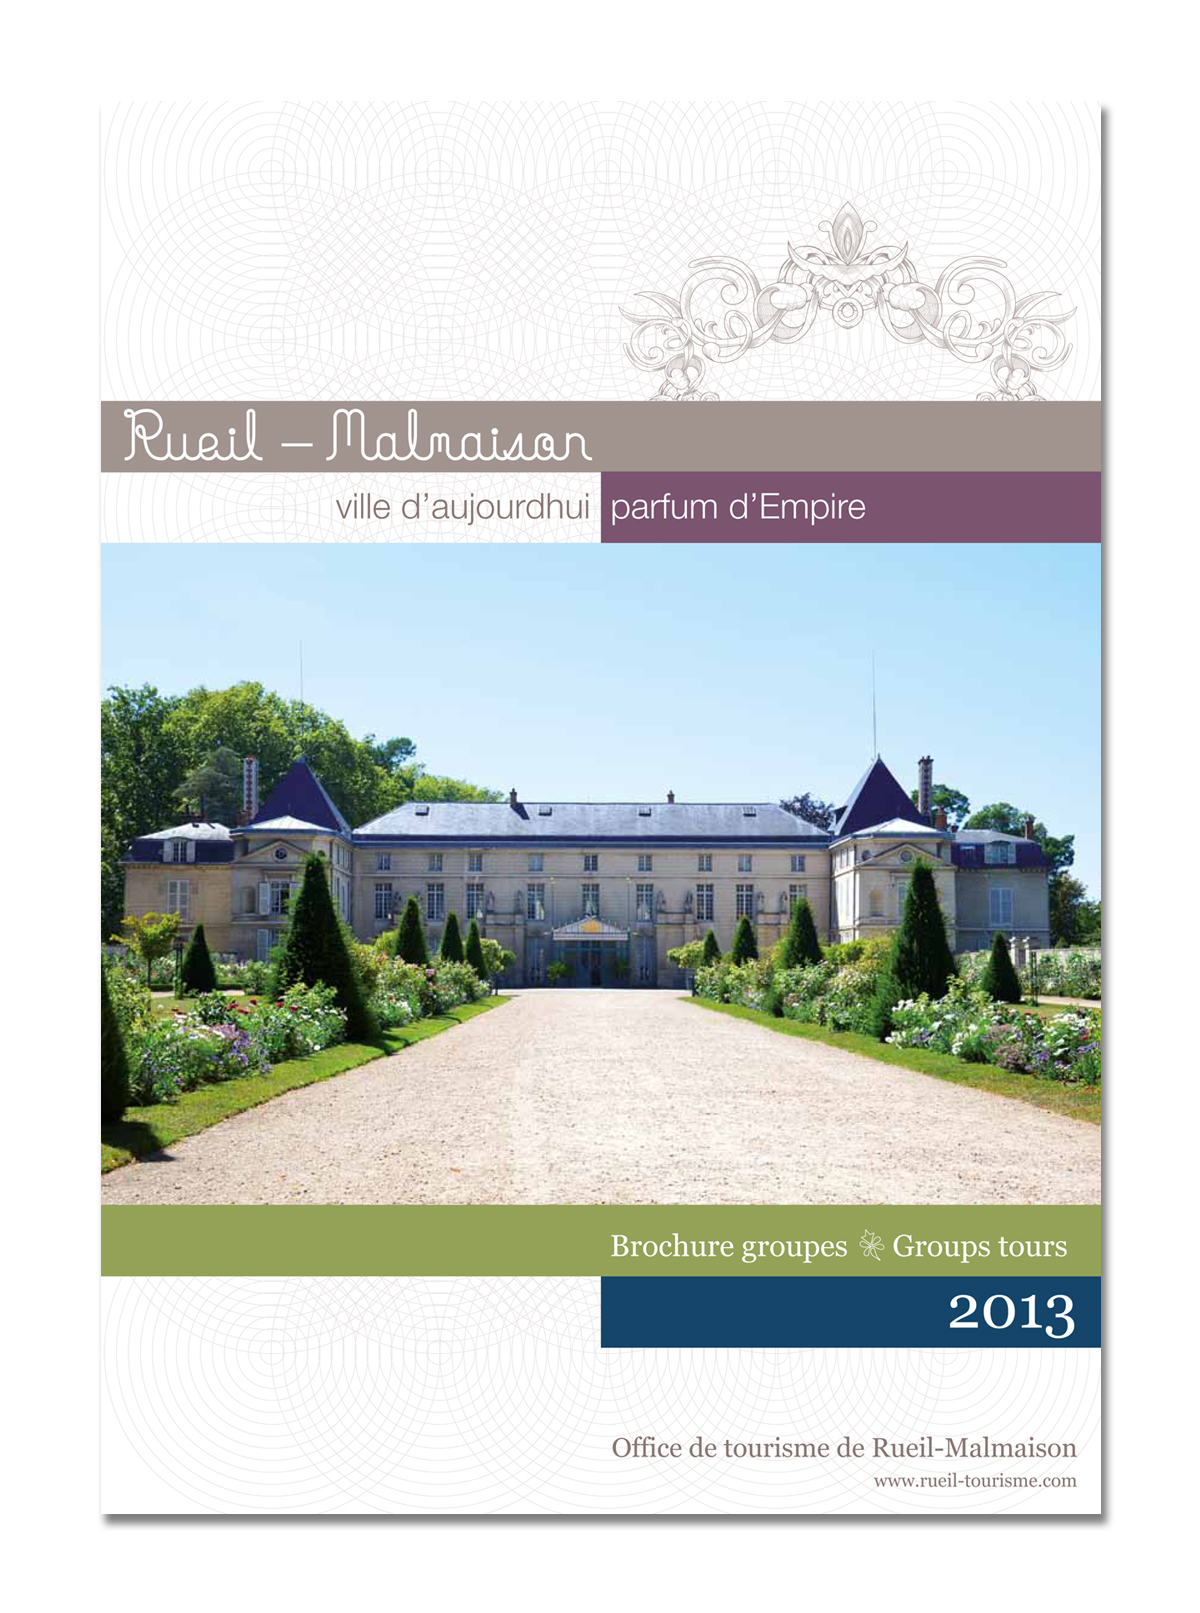 Brochure Rueil-Malmaison